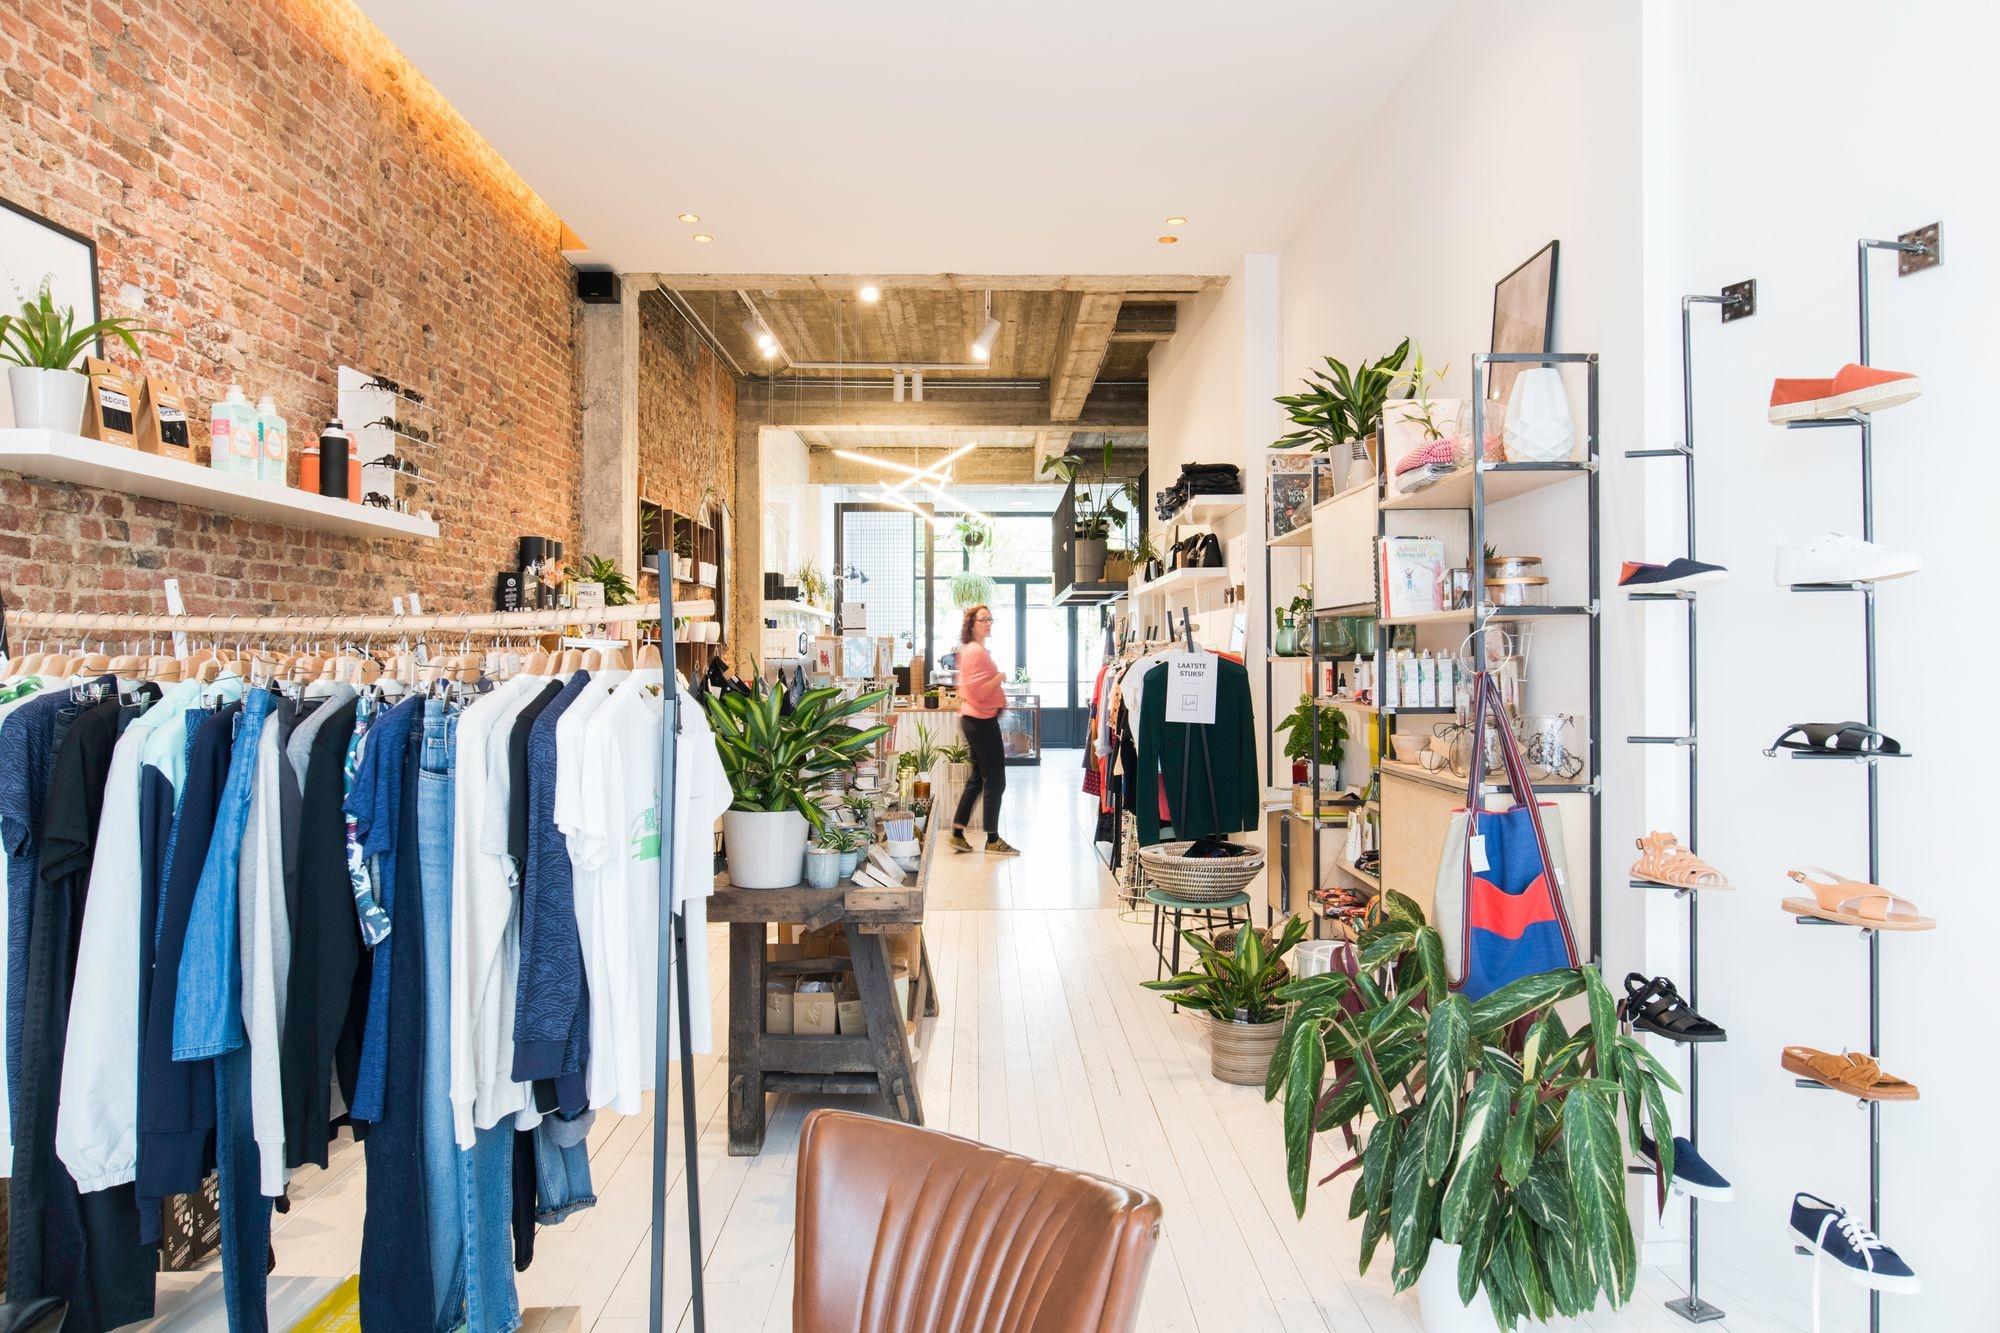 Fair fashion winkel Host in Berchem, Birgit Sterckx